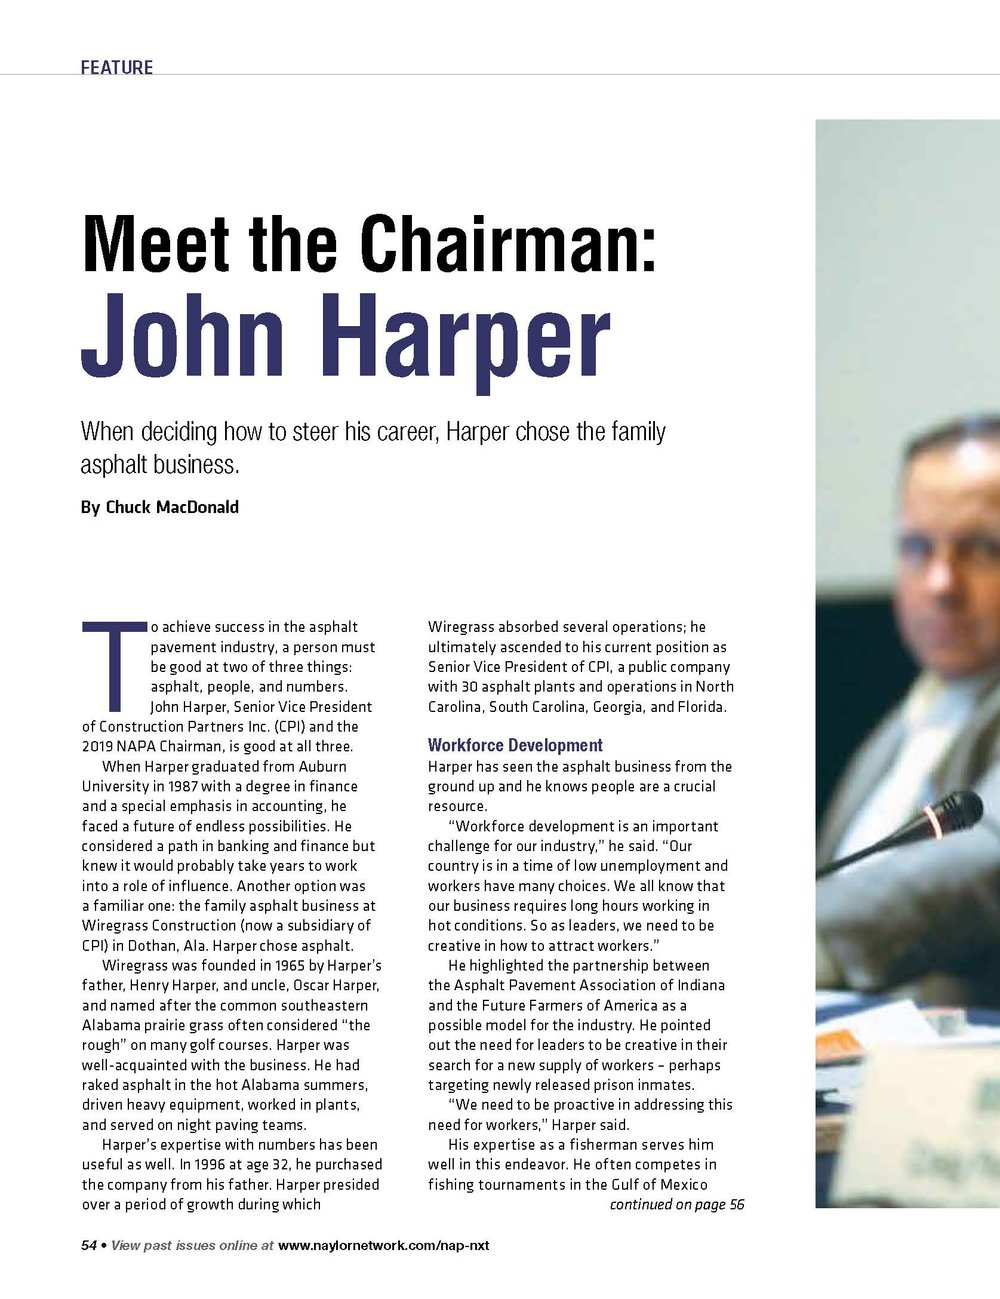 John Harper Insert_Page_1.jpg